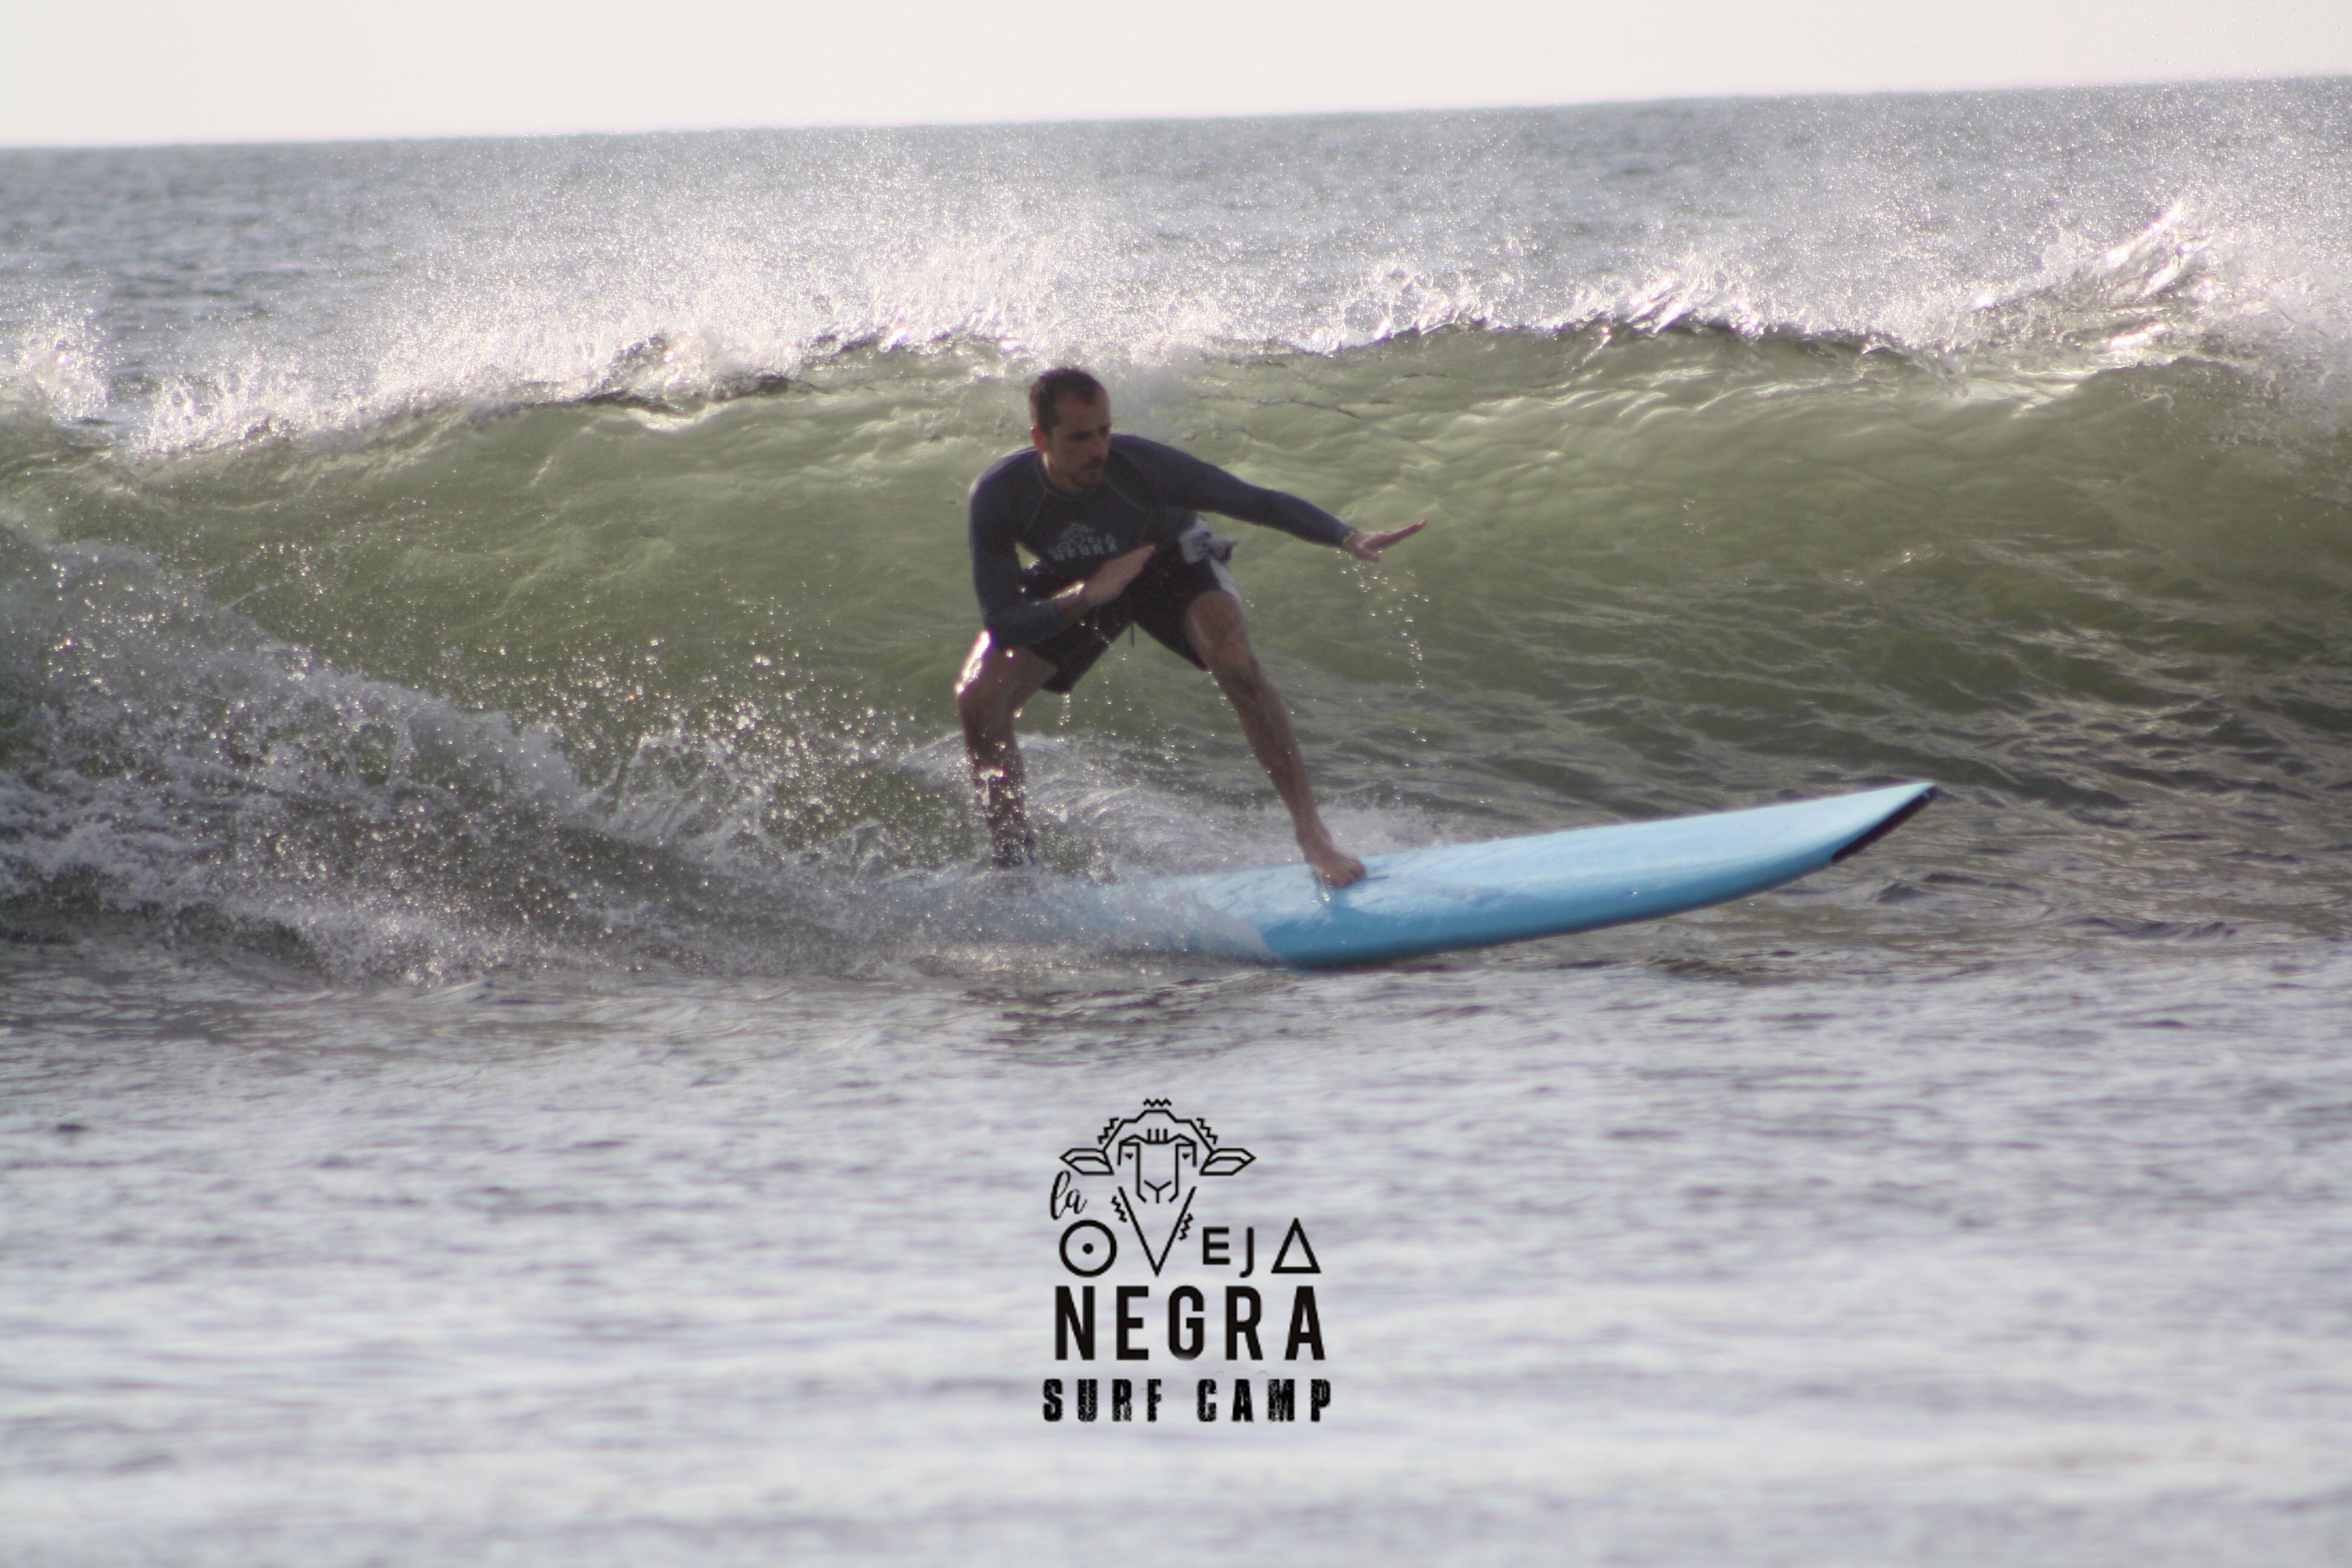 La Oveja Negra Tamarindo Surf Lesson Surf Camp Costa Rica